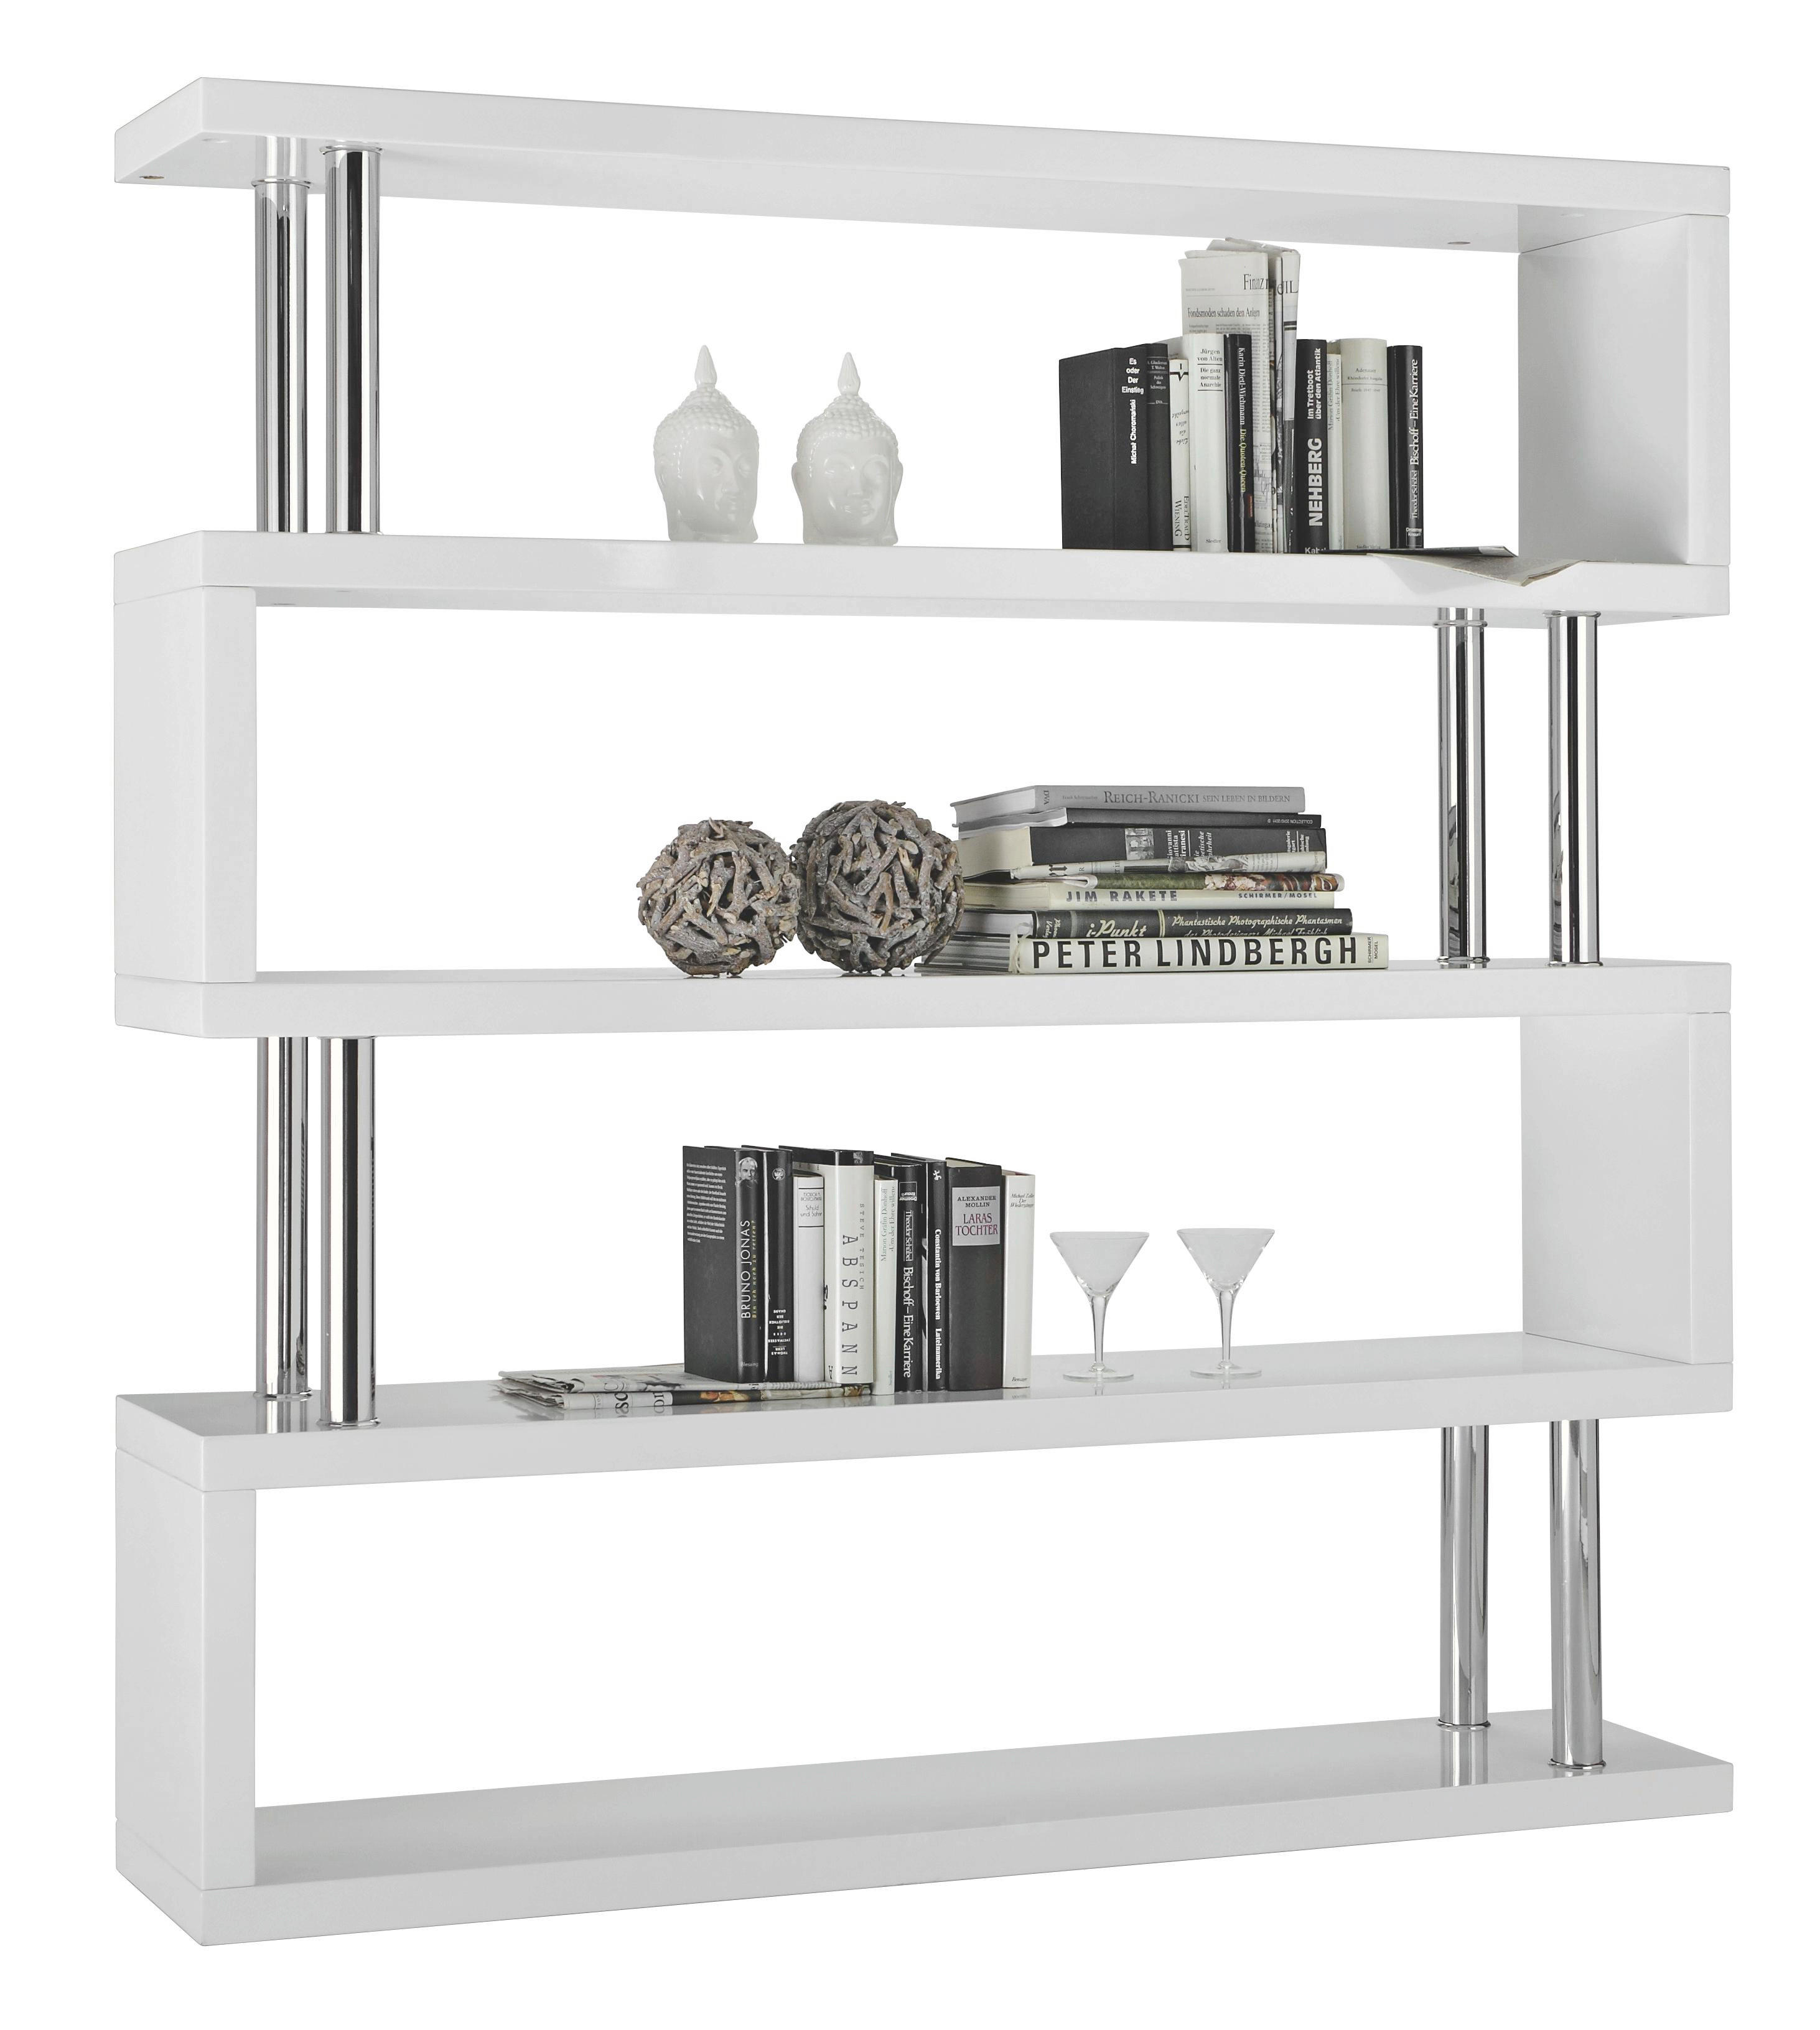 HYLLA - vit/kromfärg, Design, metall/träbaserade material (156/165/35cm) - CARRYHOME